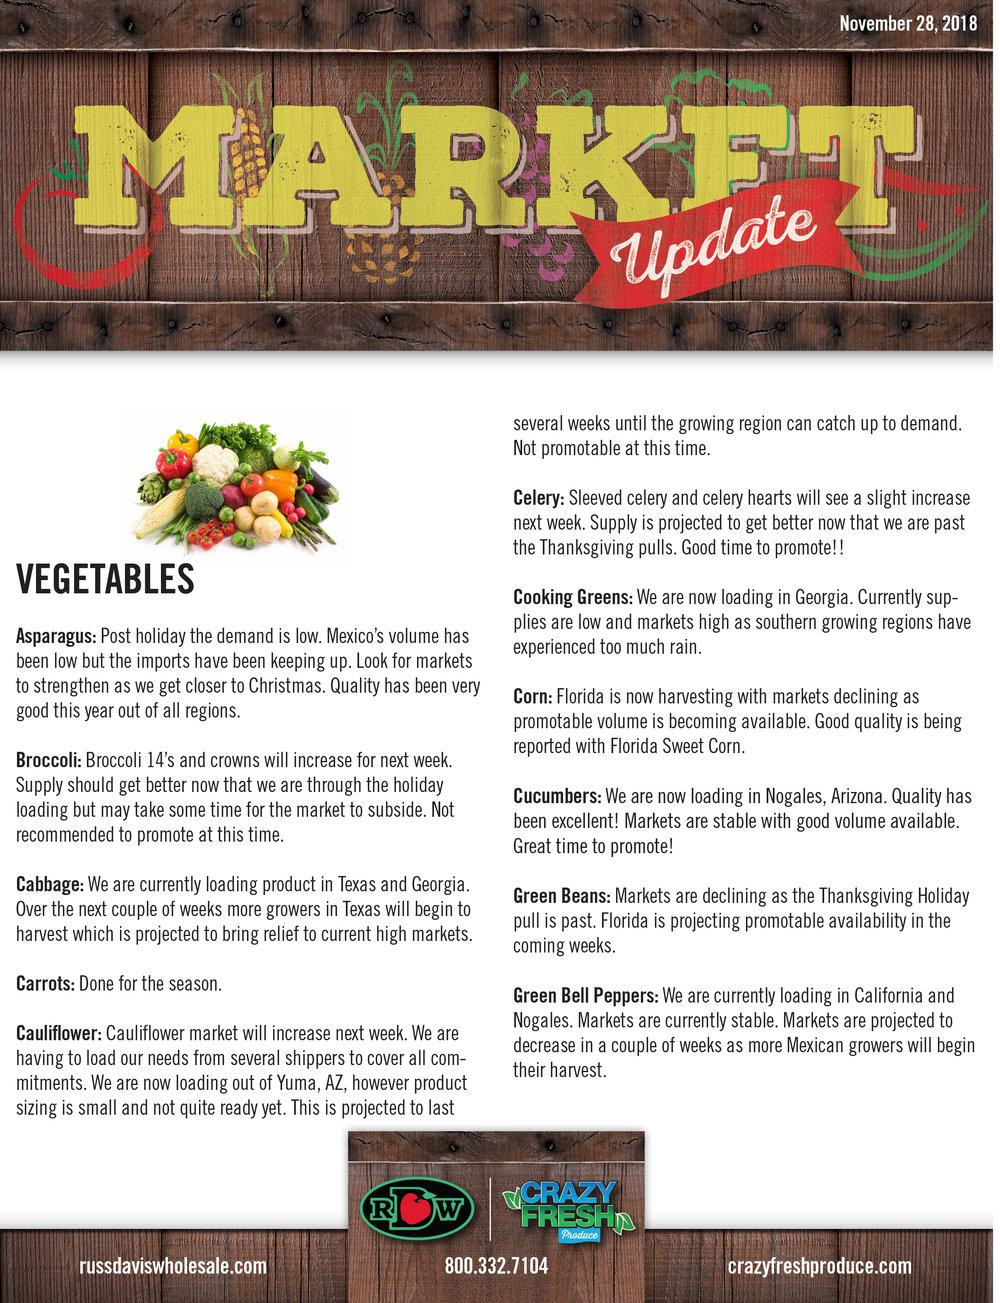 RDW_Market_Update_Nov28_2018 1.jpg